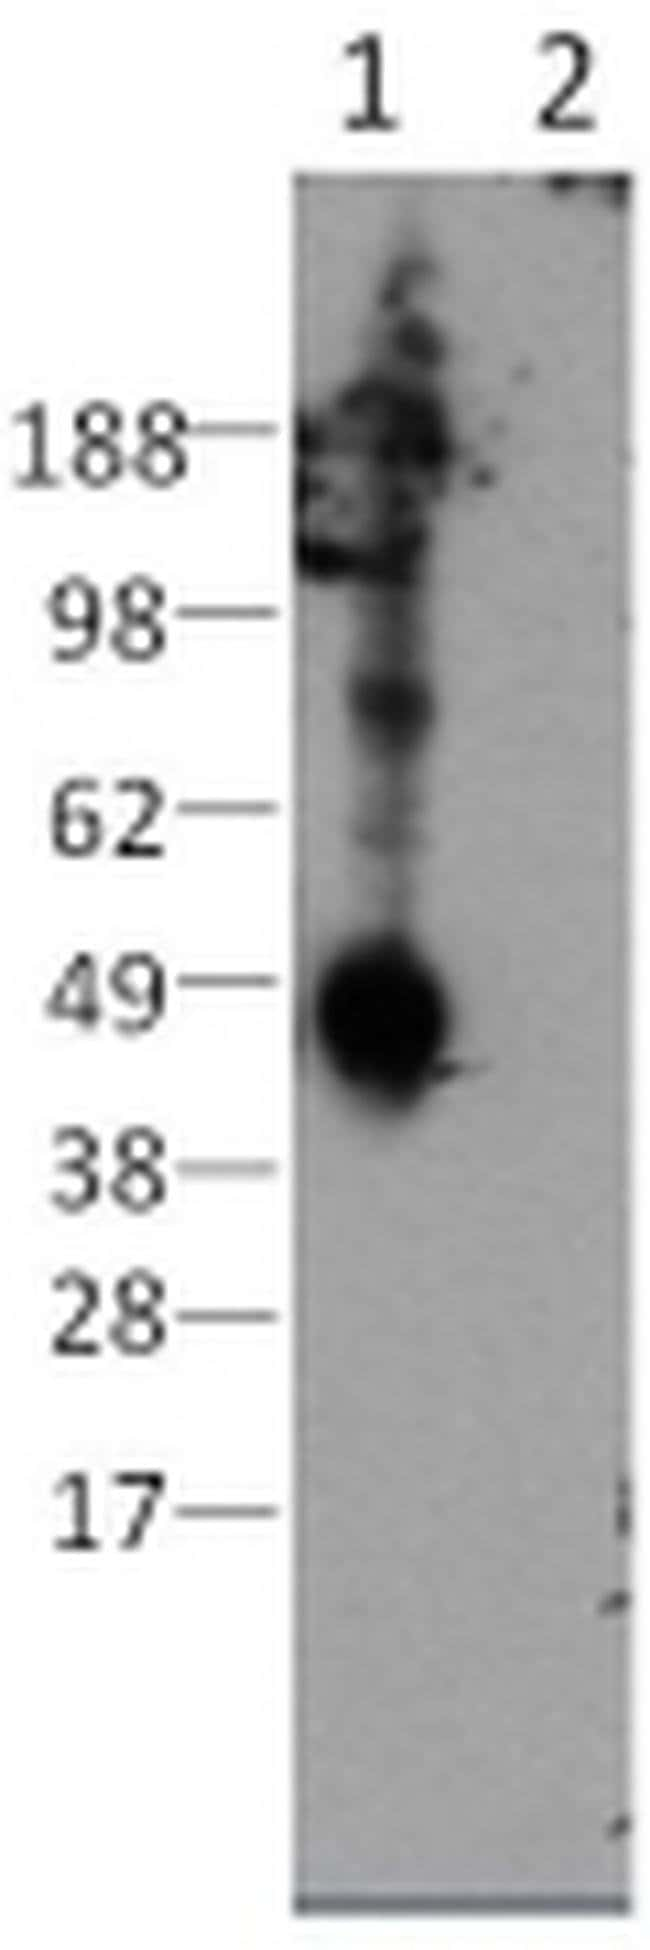 CD207 (Langerin) Rat anti-Mouse, Clone: eBioL31, eBioscience ::